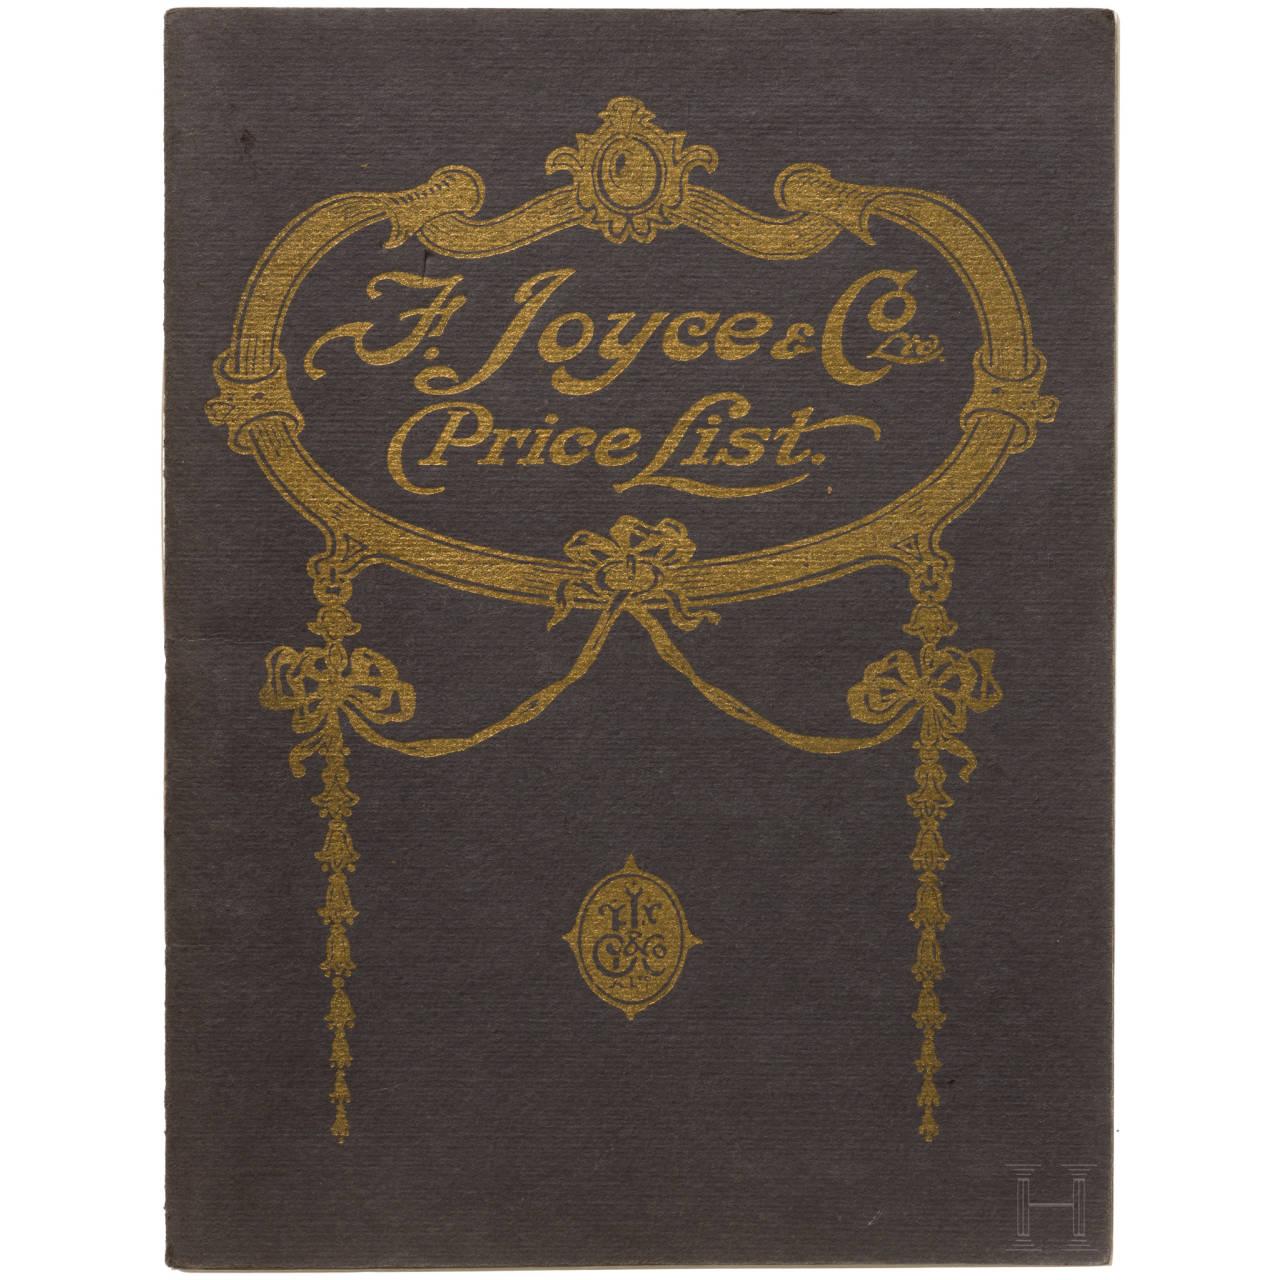 "F. Joyce & Co., London ""Amunition Price List"", 1909/10"